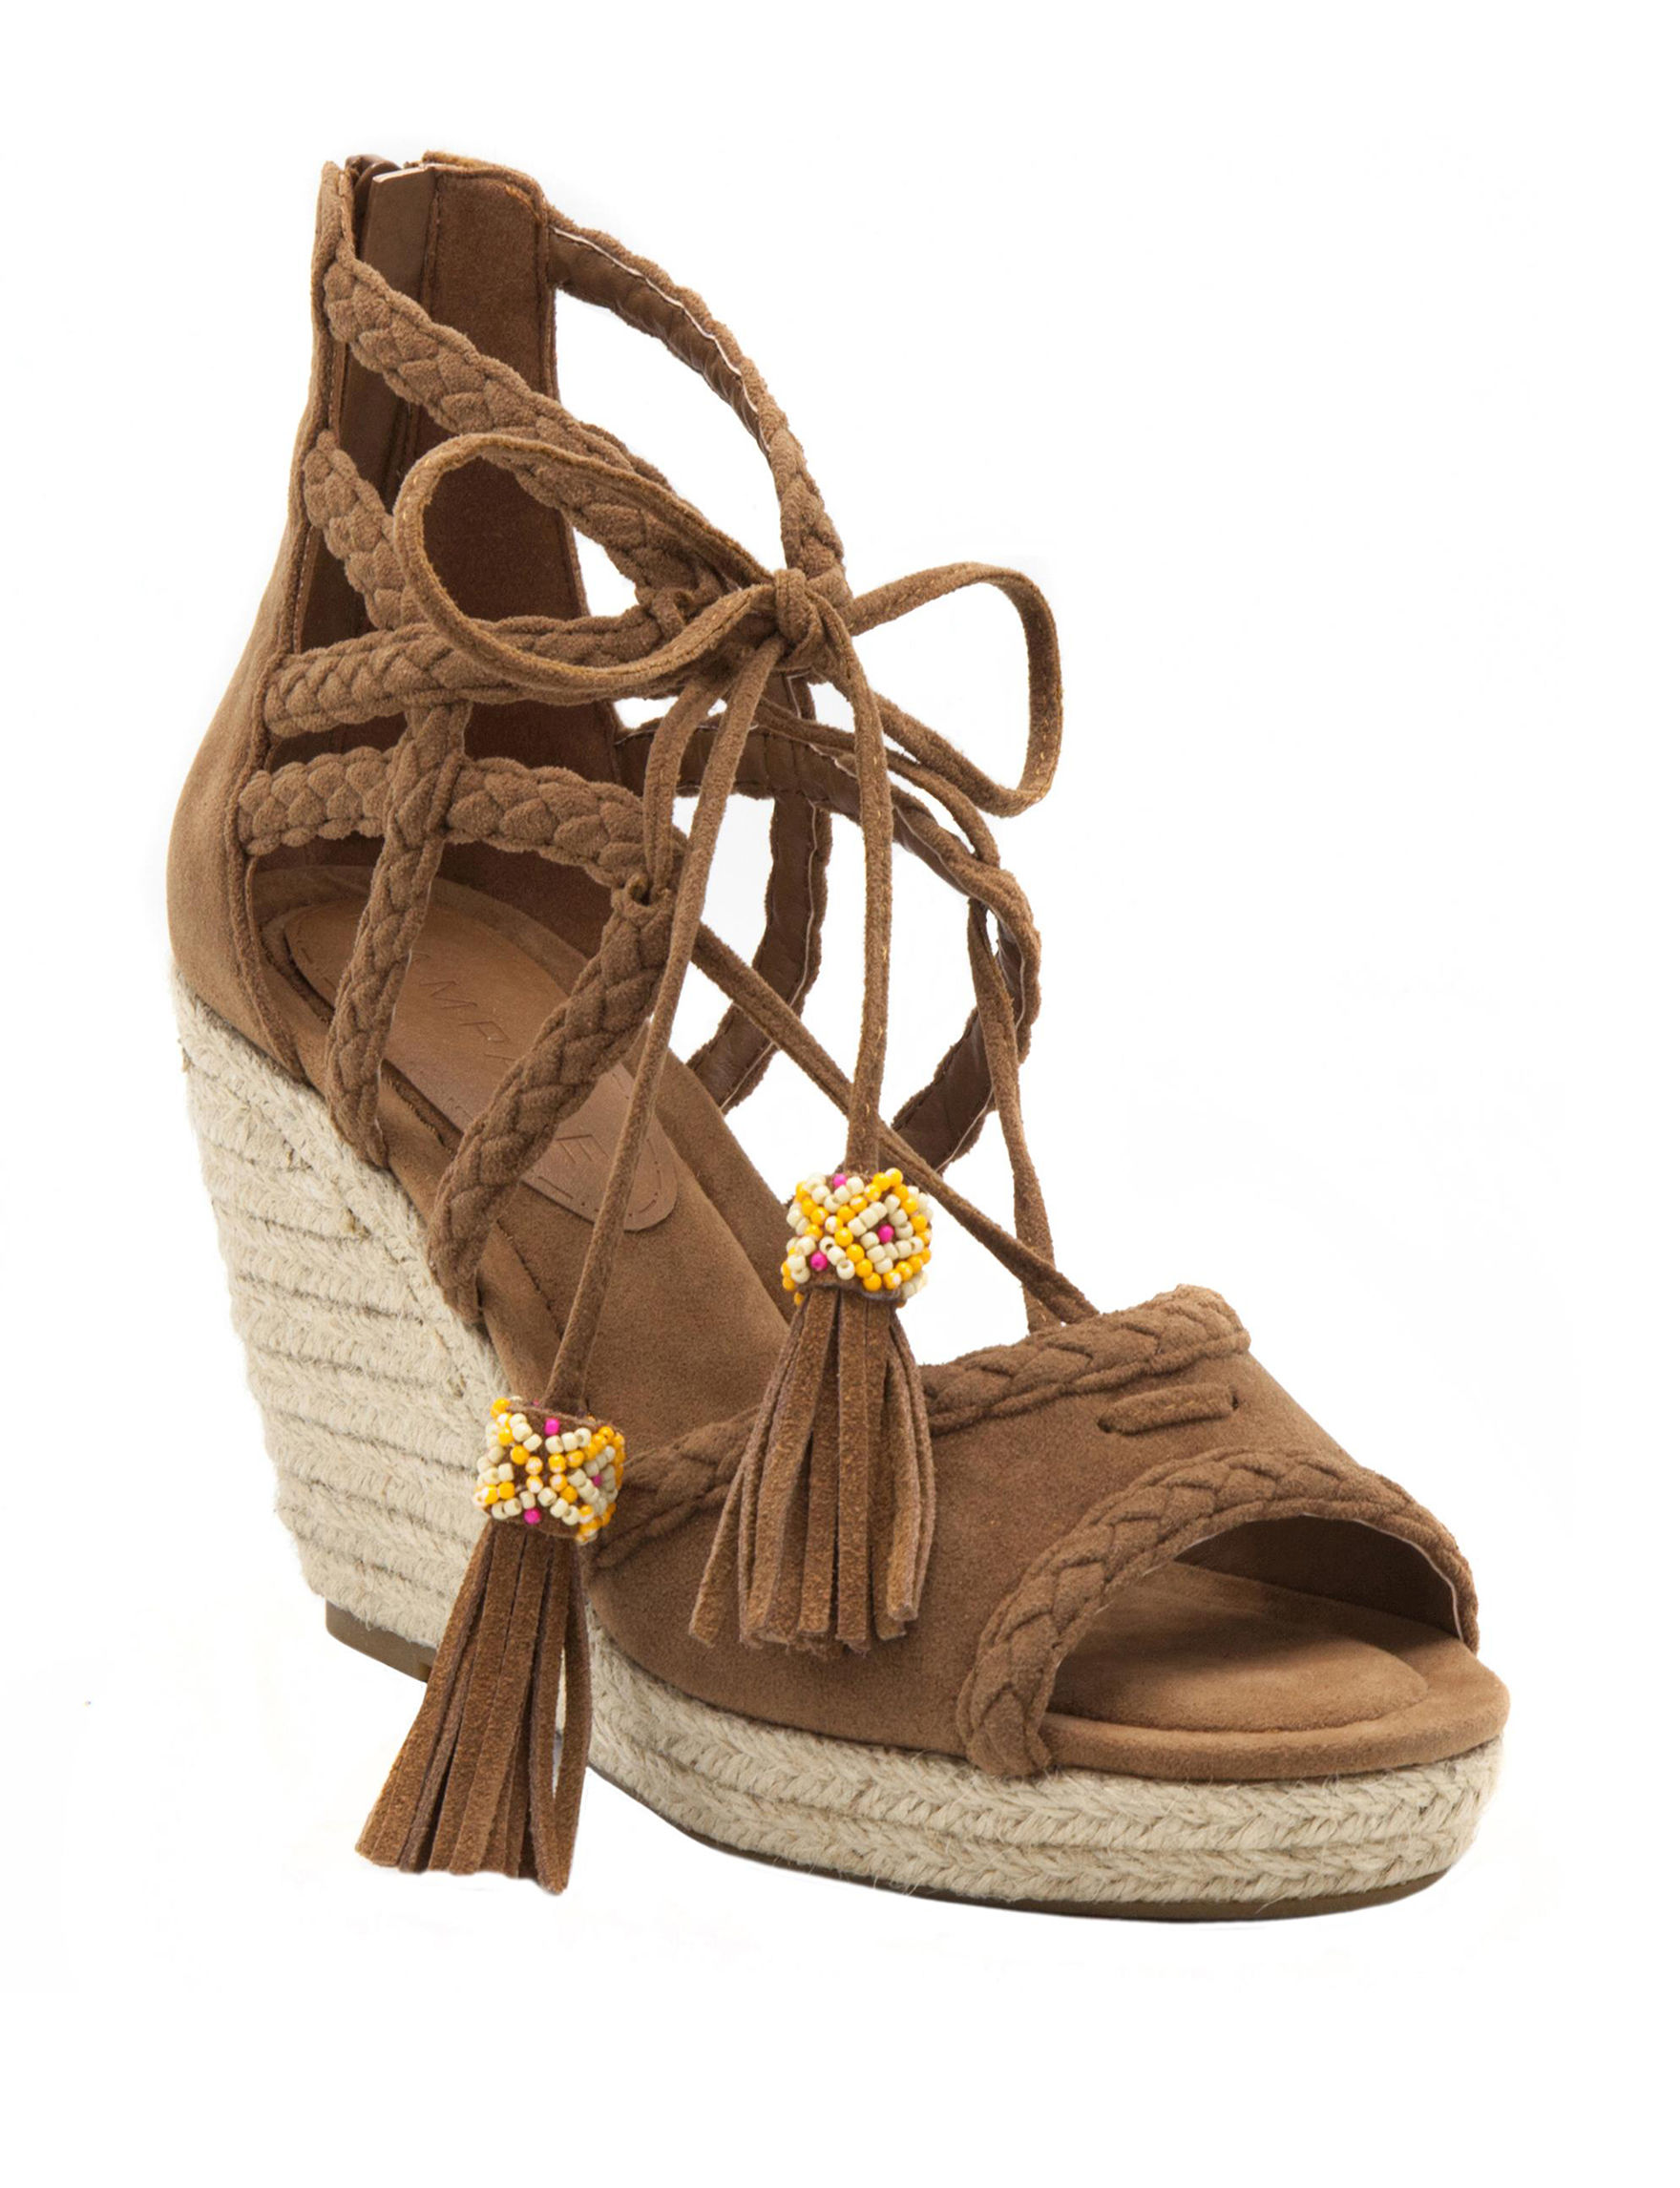 Rampage Tan Wedge Sandals